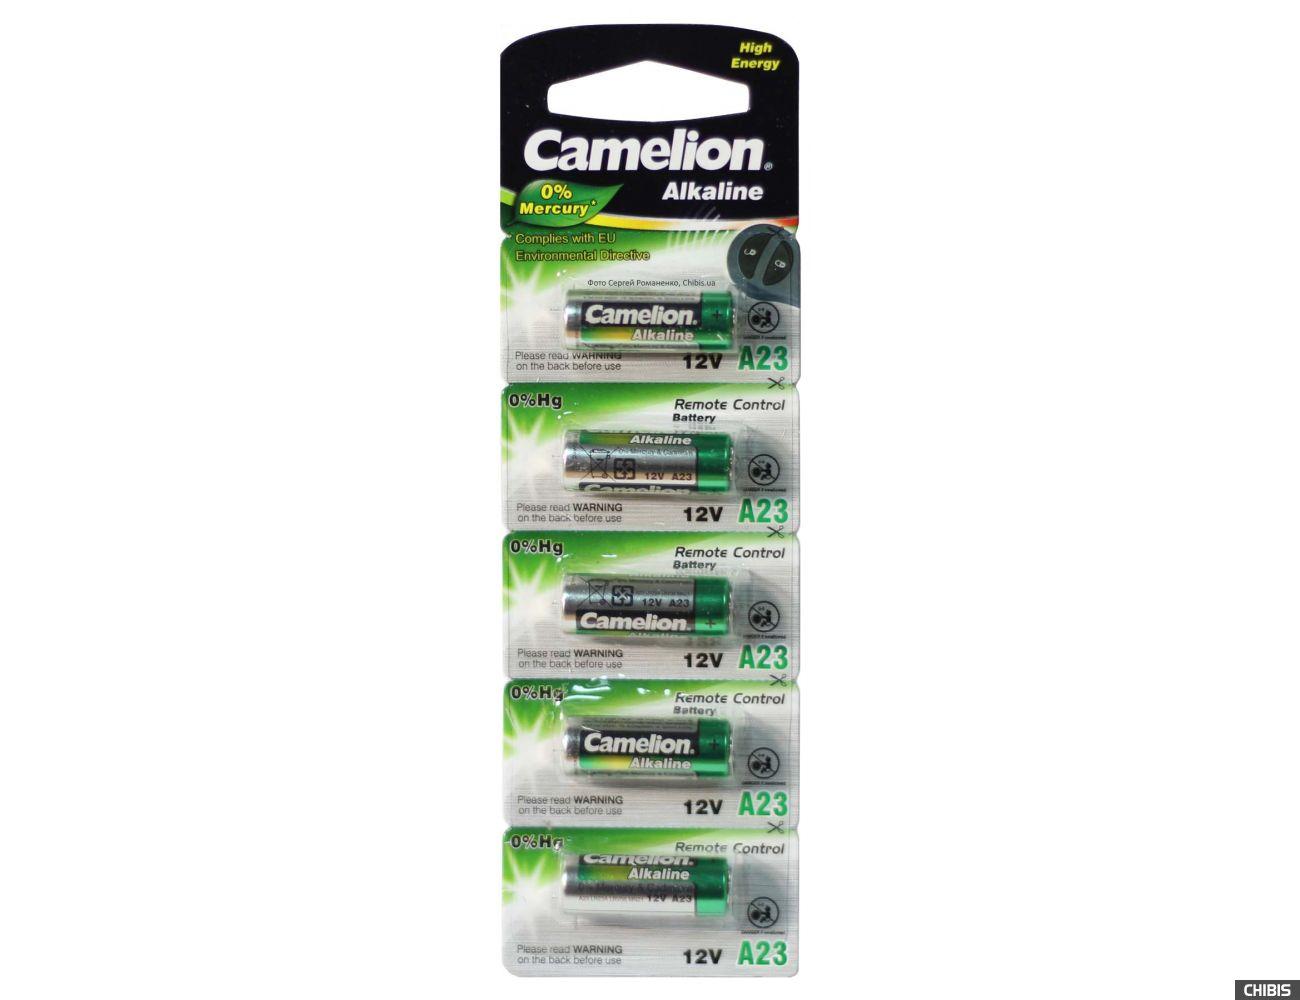 Батарейка А23 (MN21) Alkaline 12V Camelion 23GA L1028 5 шт